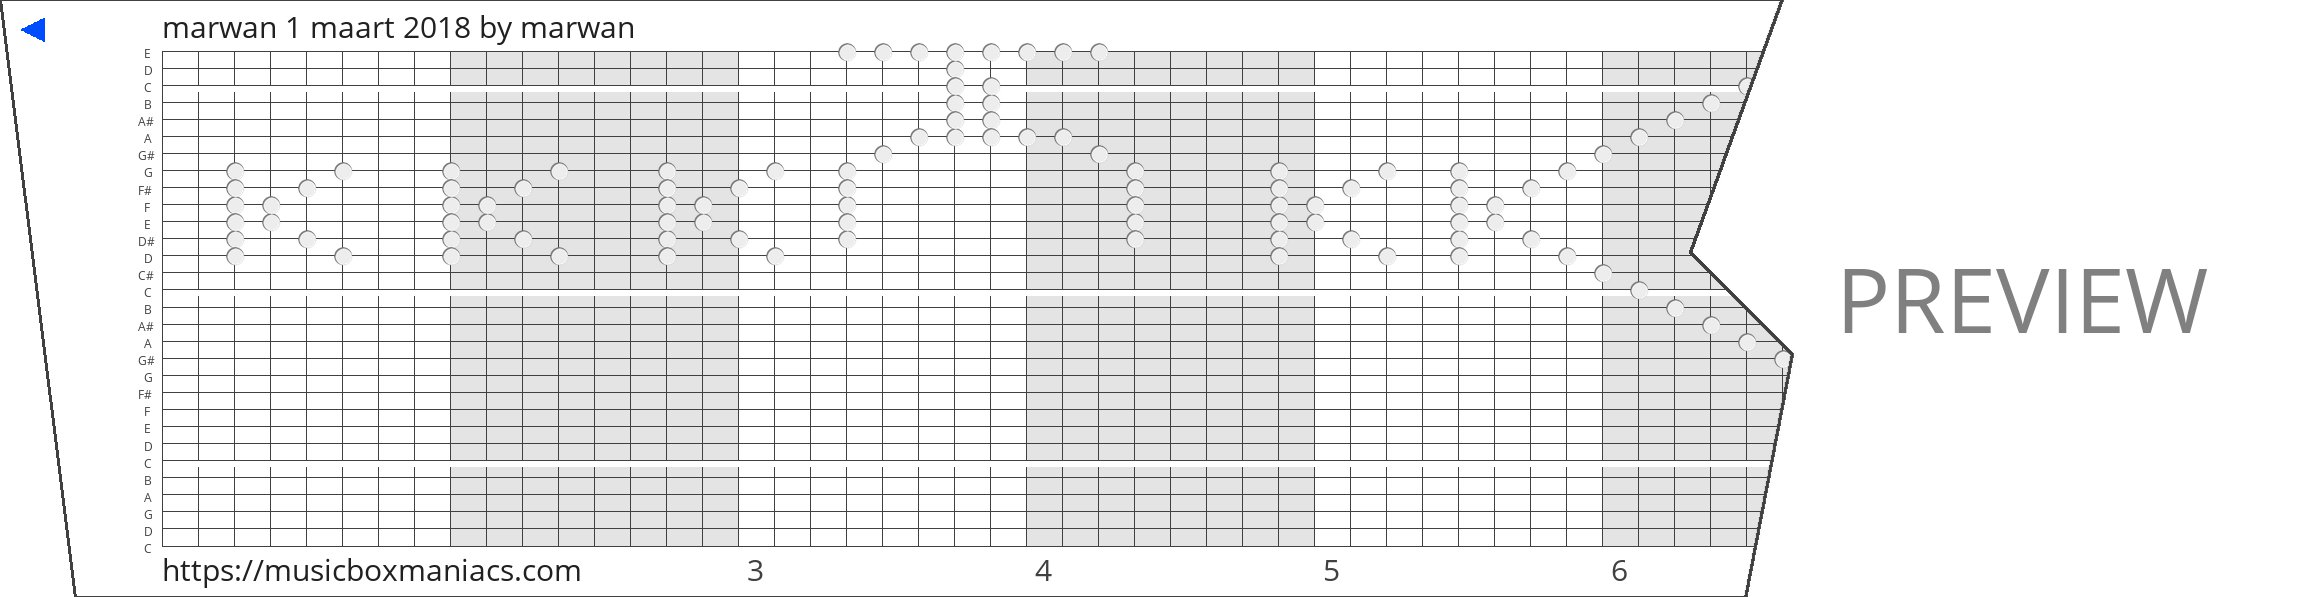 marwan 1 maart 2018 30 note music box paper strip